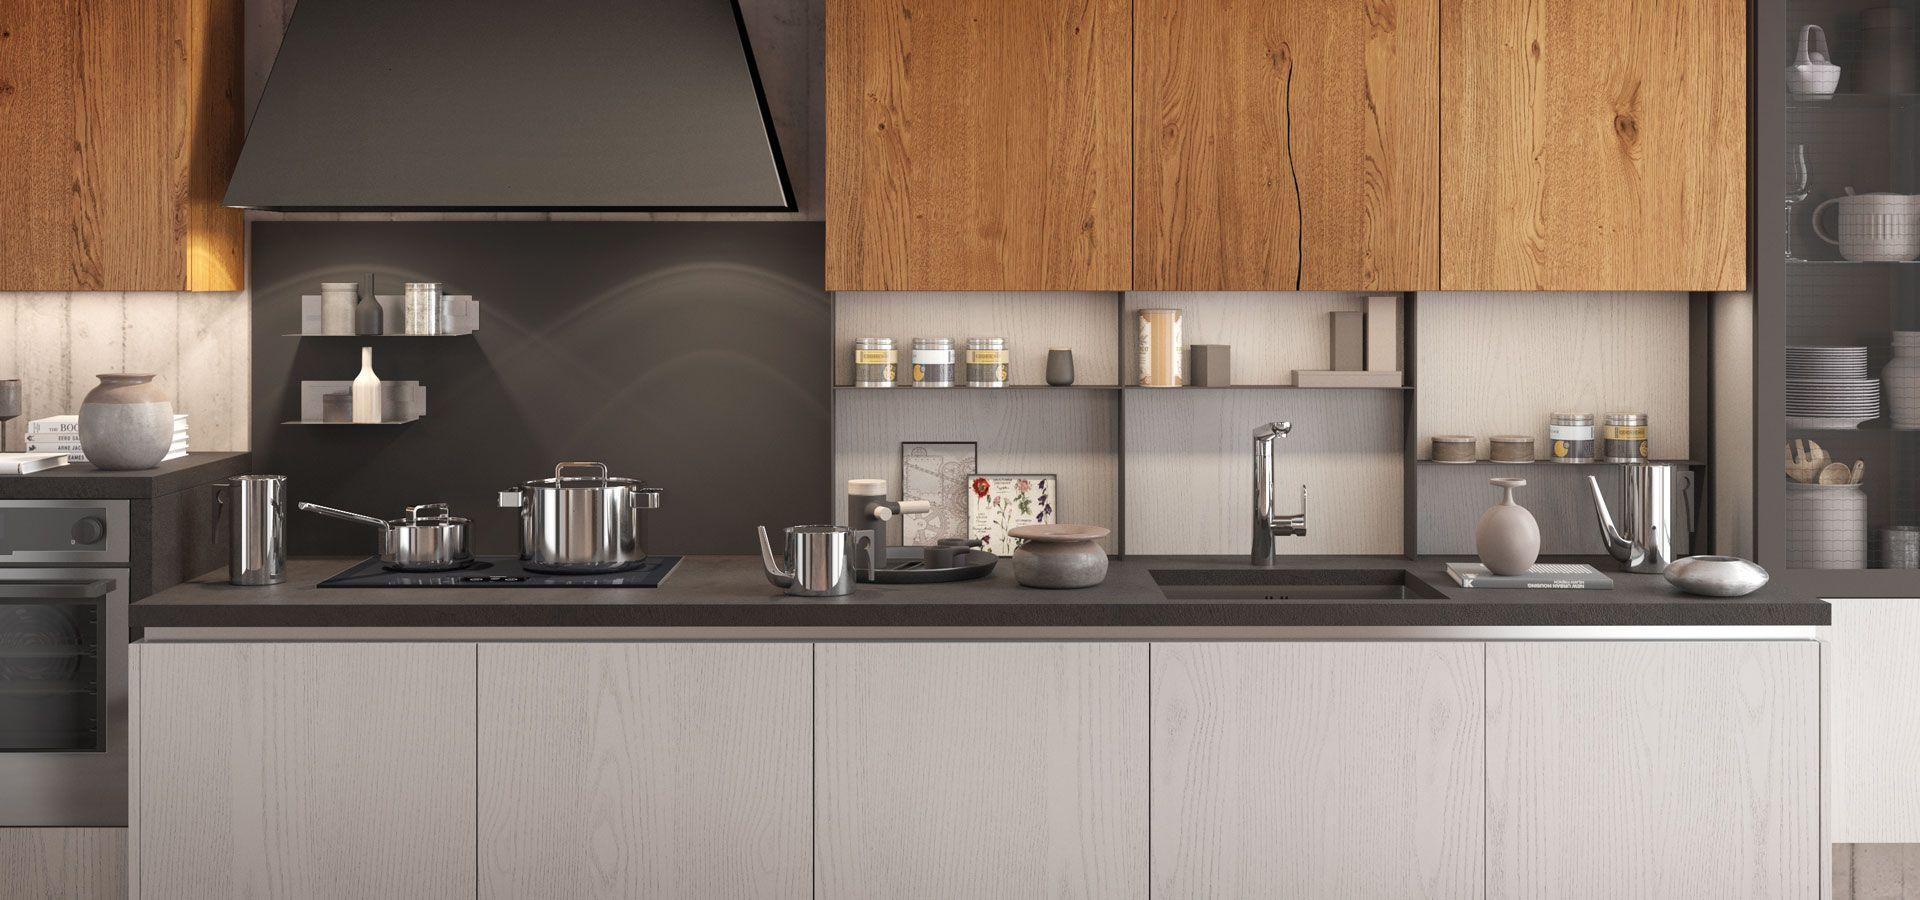 Gola  Italian Design Kitchens  Küchen  Pinterest  Asia Stunning Italian Design Kitchen Inspiration Design